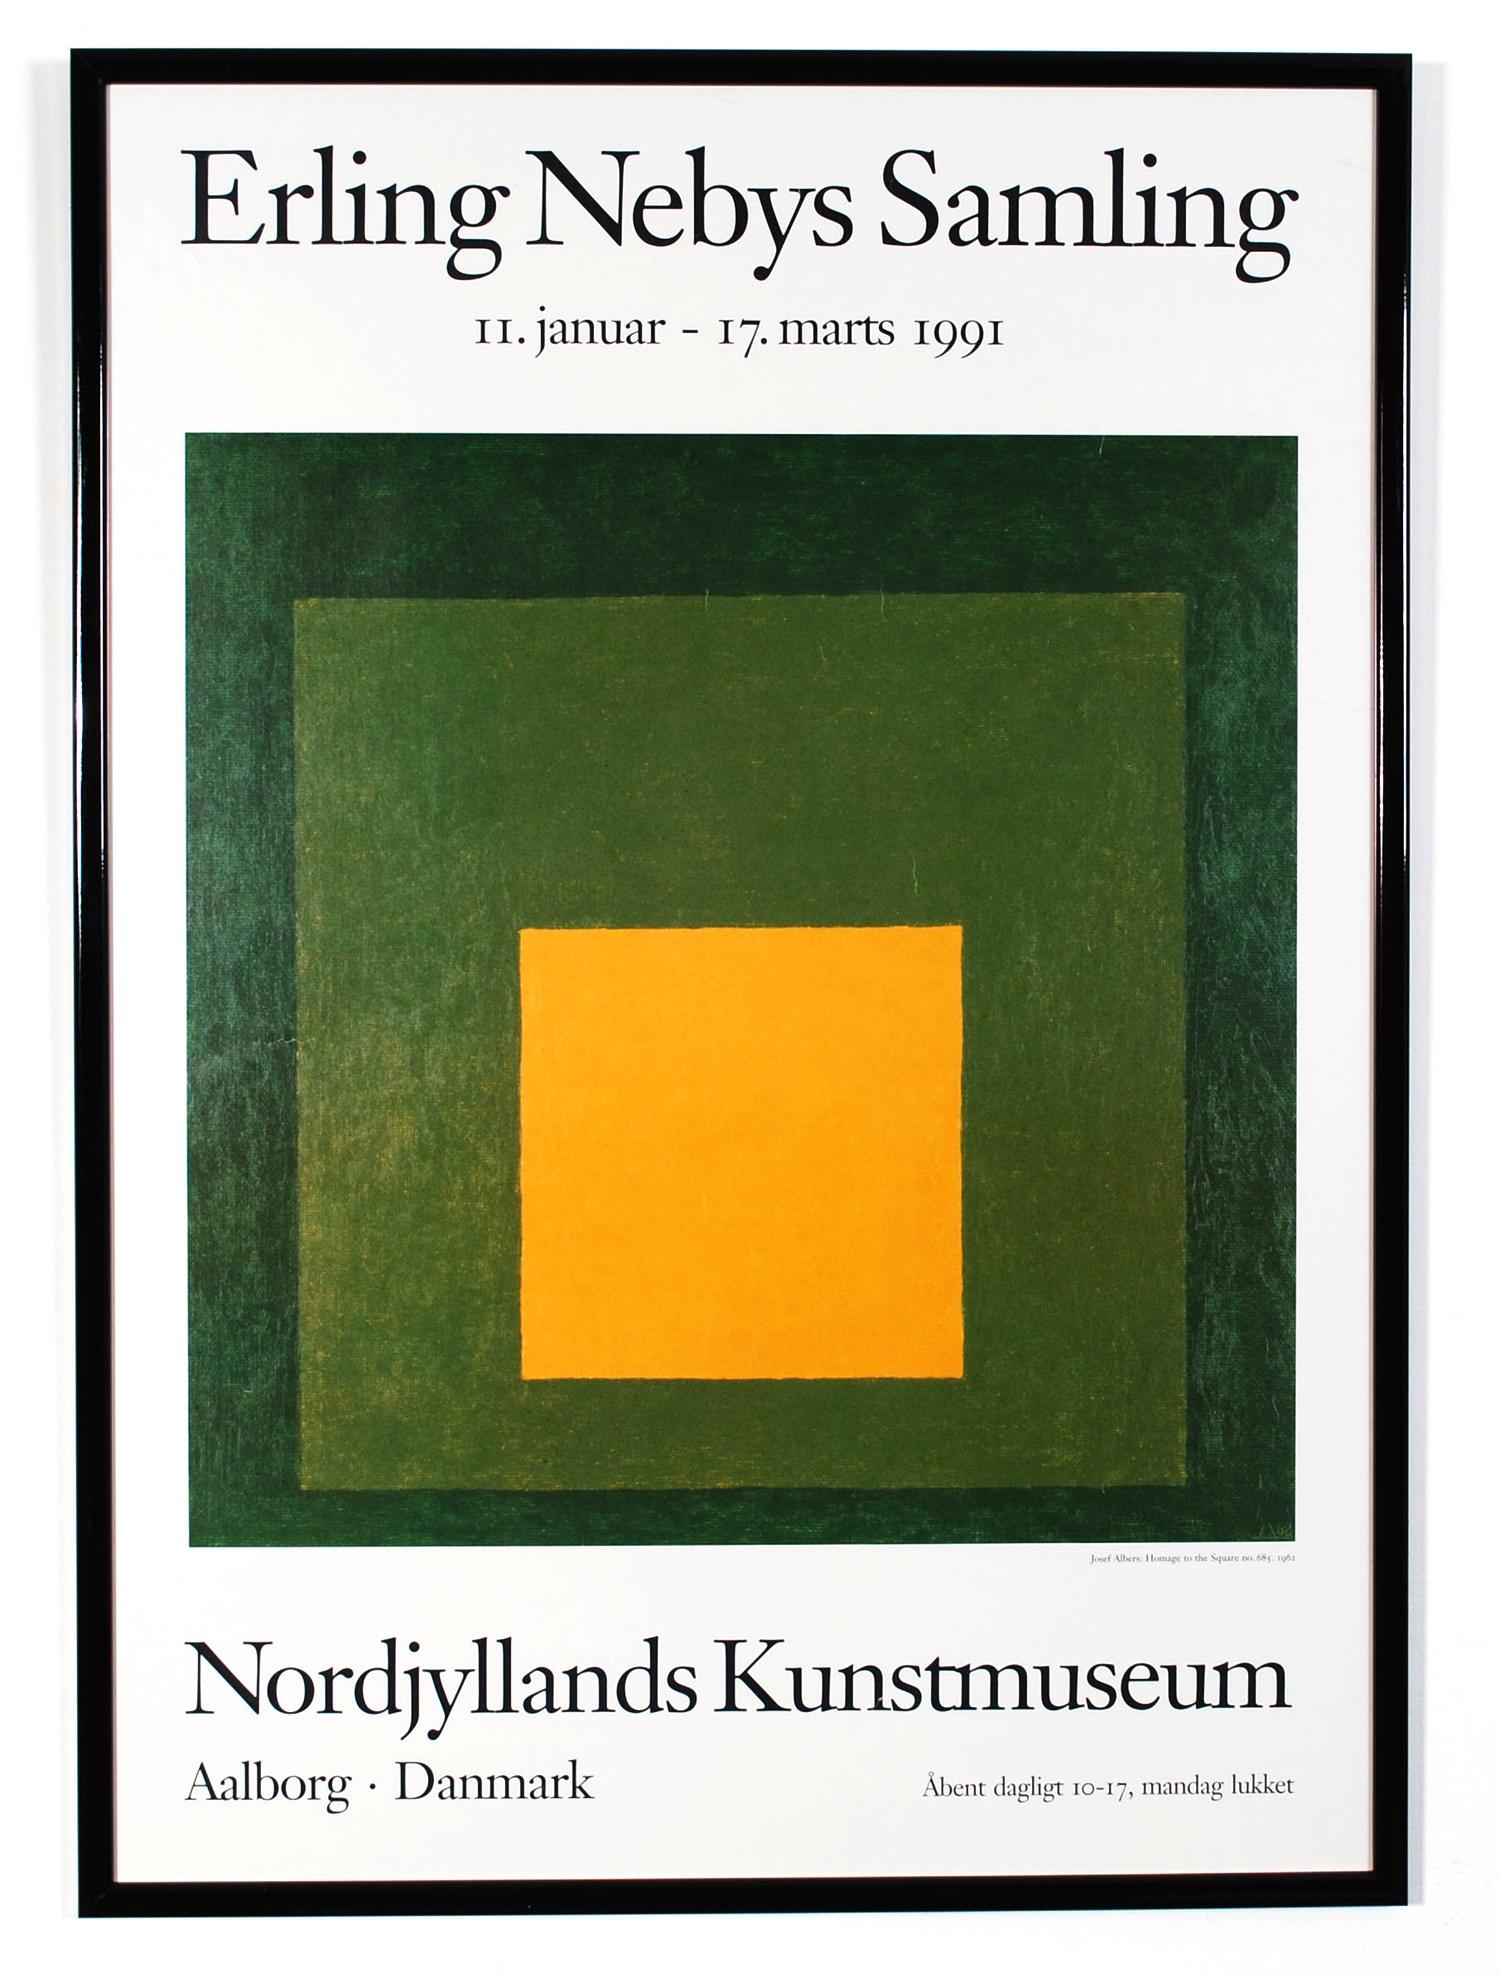 Original poster Erling Nebys Samling - Nordjyllands Kunstmuseum - Aalborg Danmark - 1991